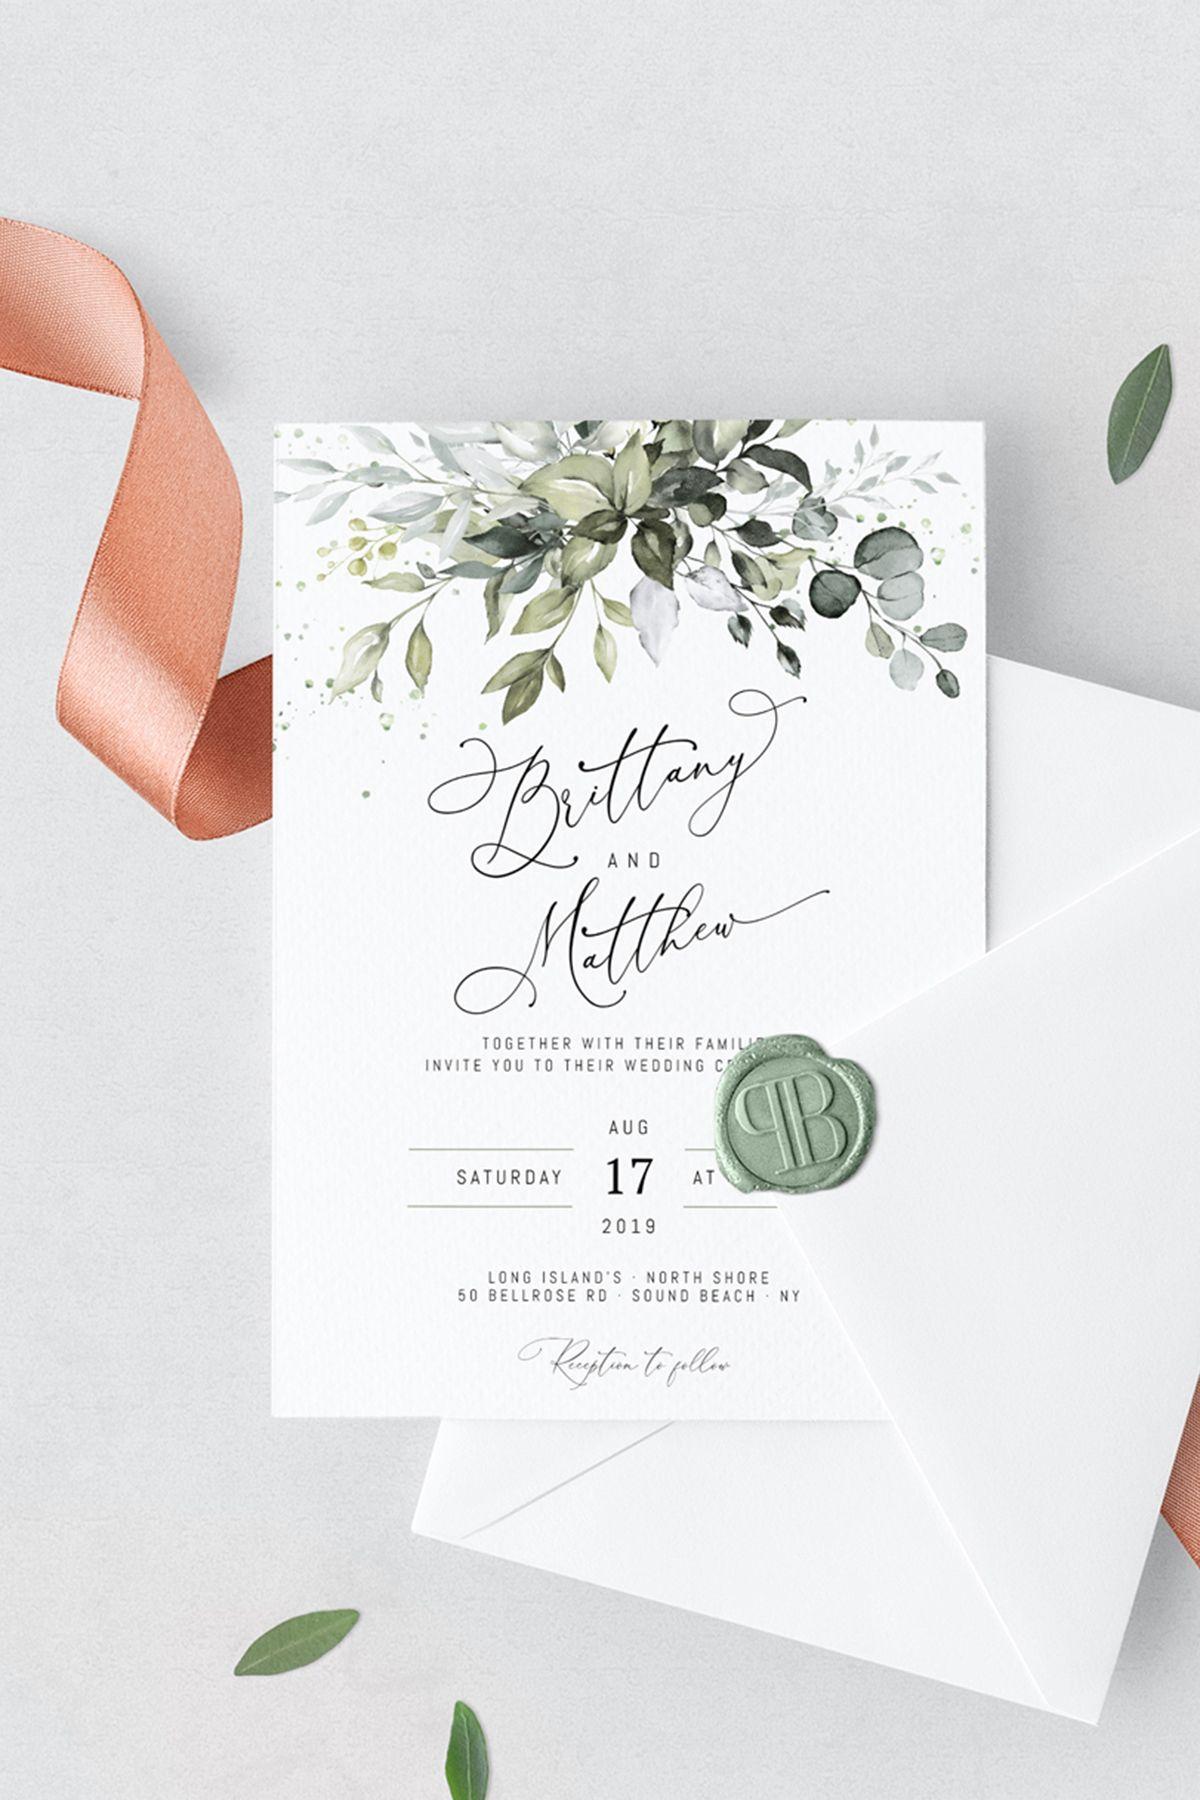 Reese Wedding Invitation Template Wedding Invite Wedding Etsy In 2020 Boho Wedding Invitation Template Wedding Invitation Templates Wedding Invitations